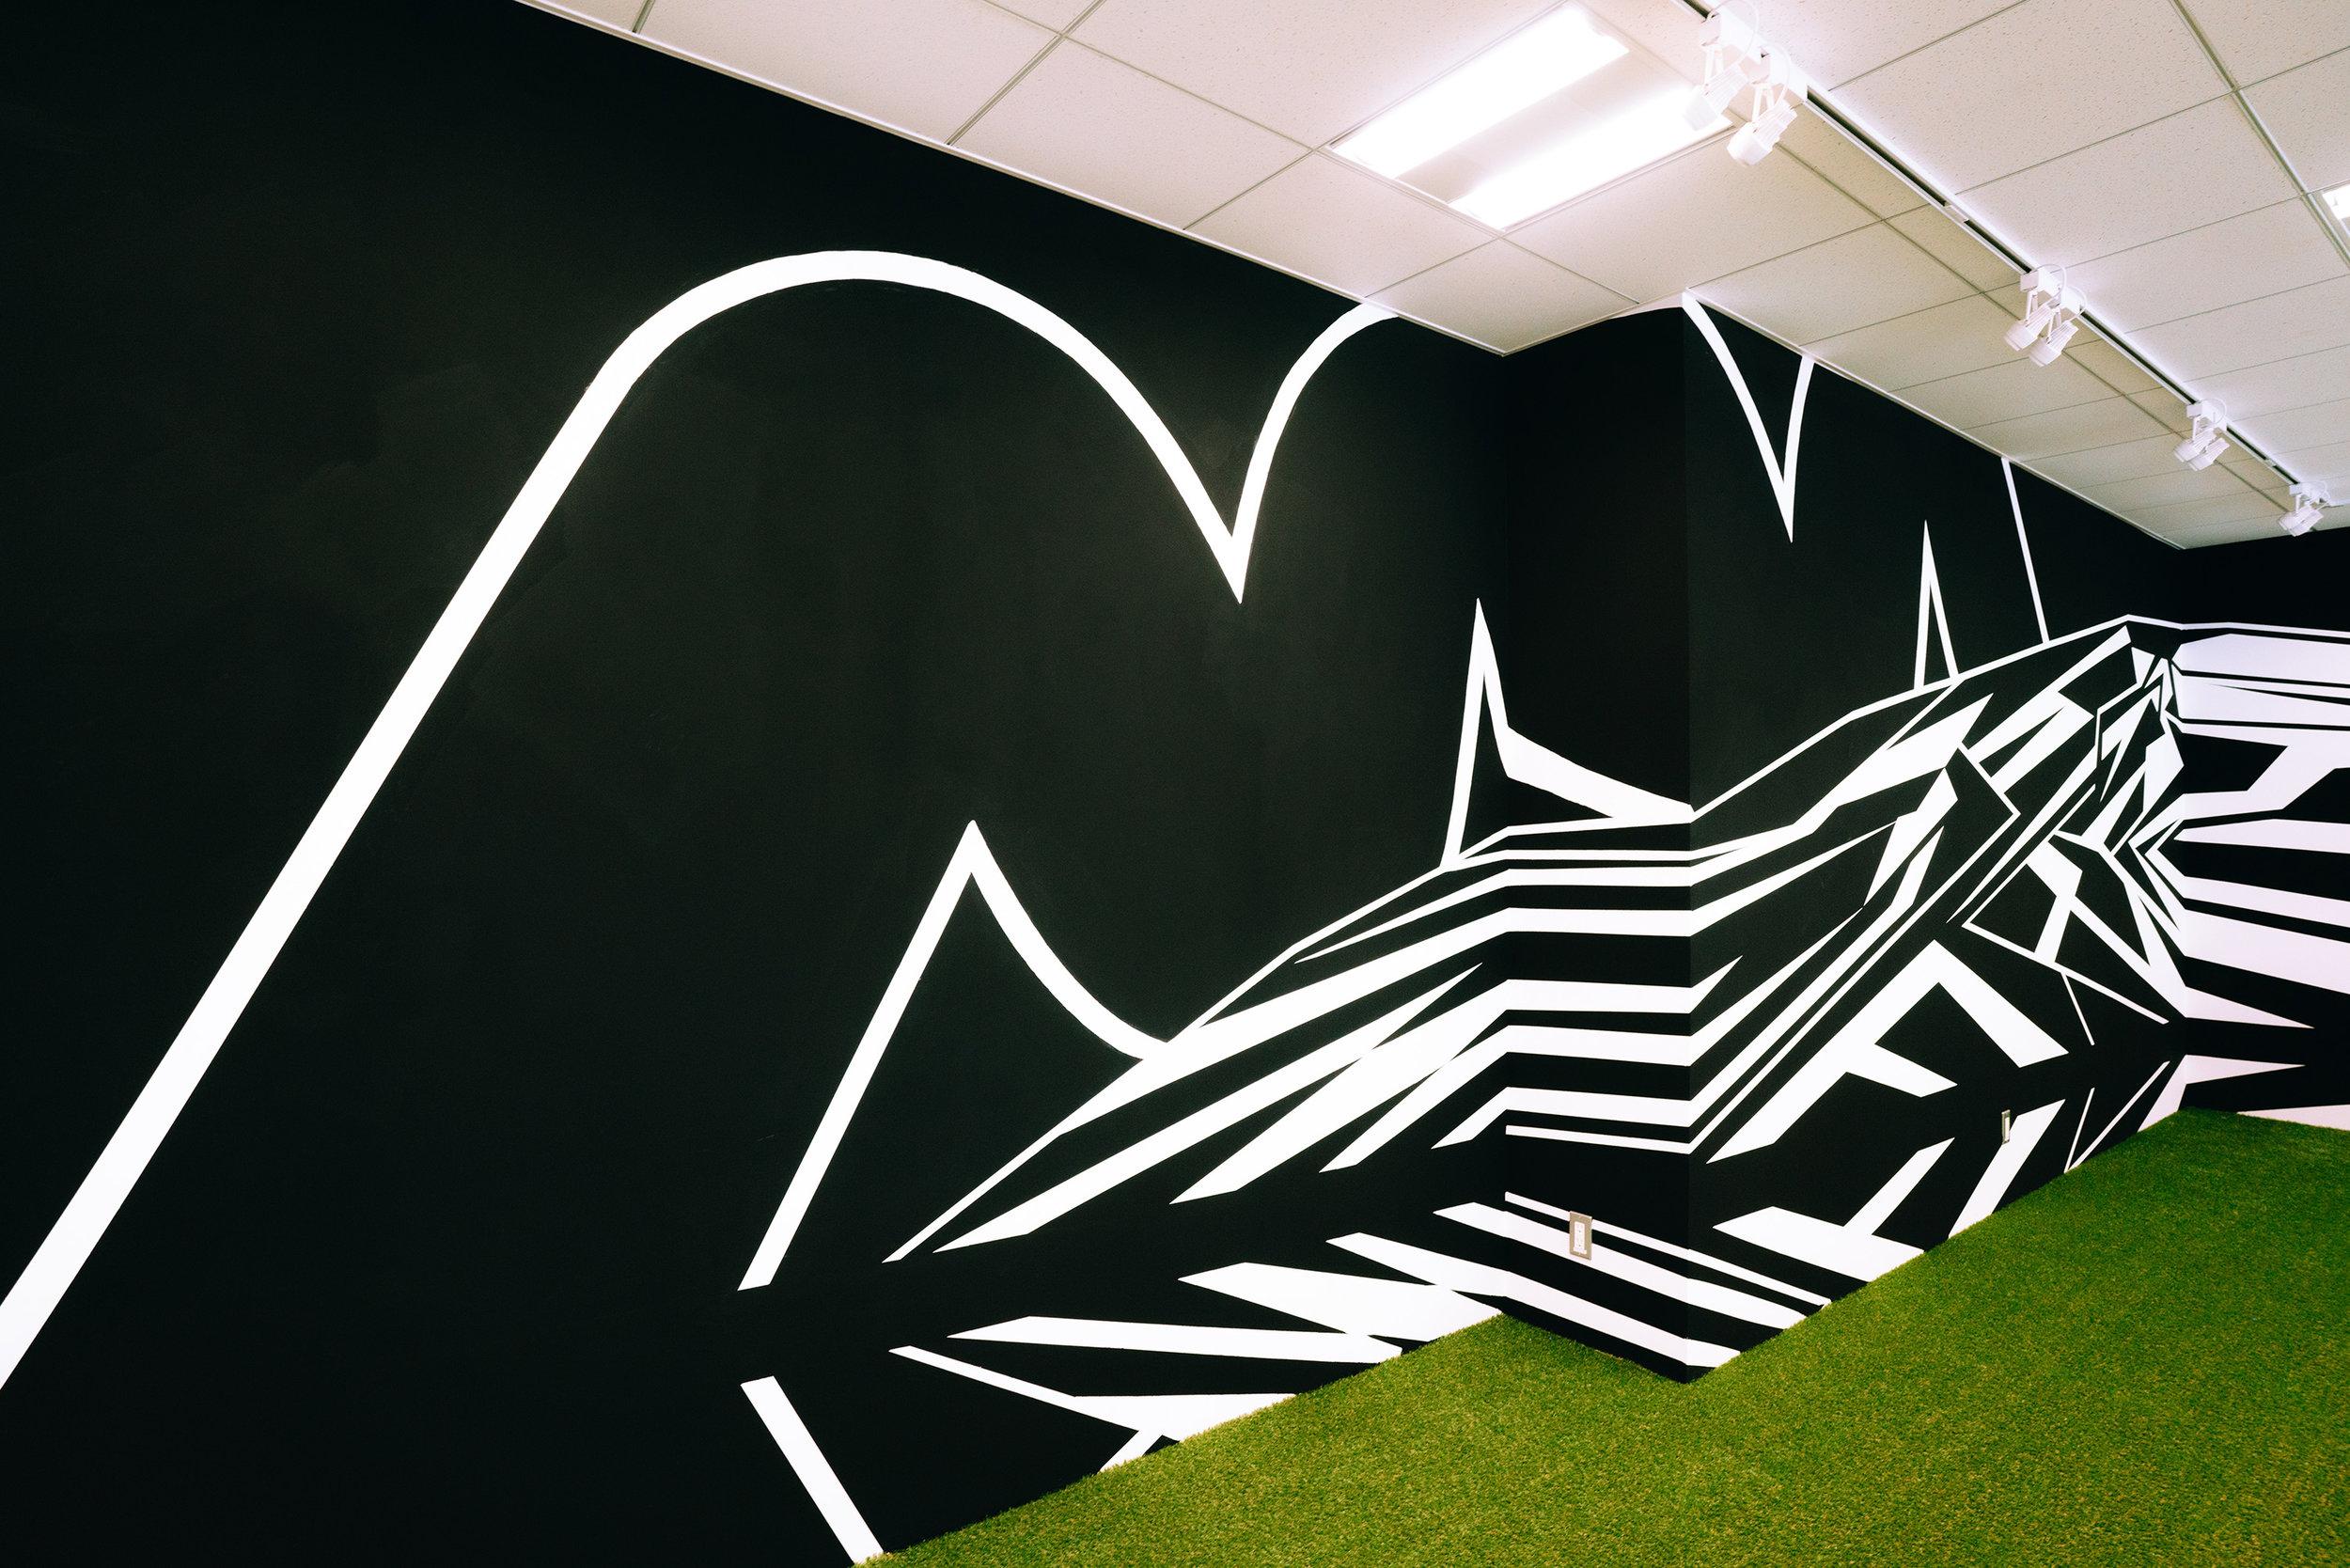 mark lona mural japan-15.jpg